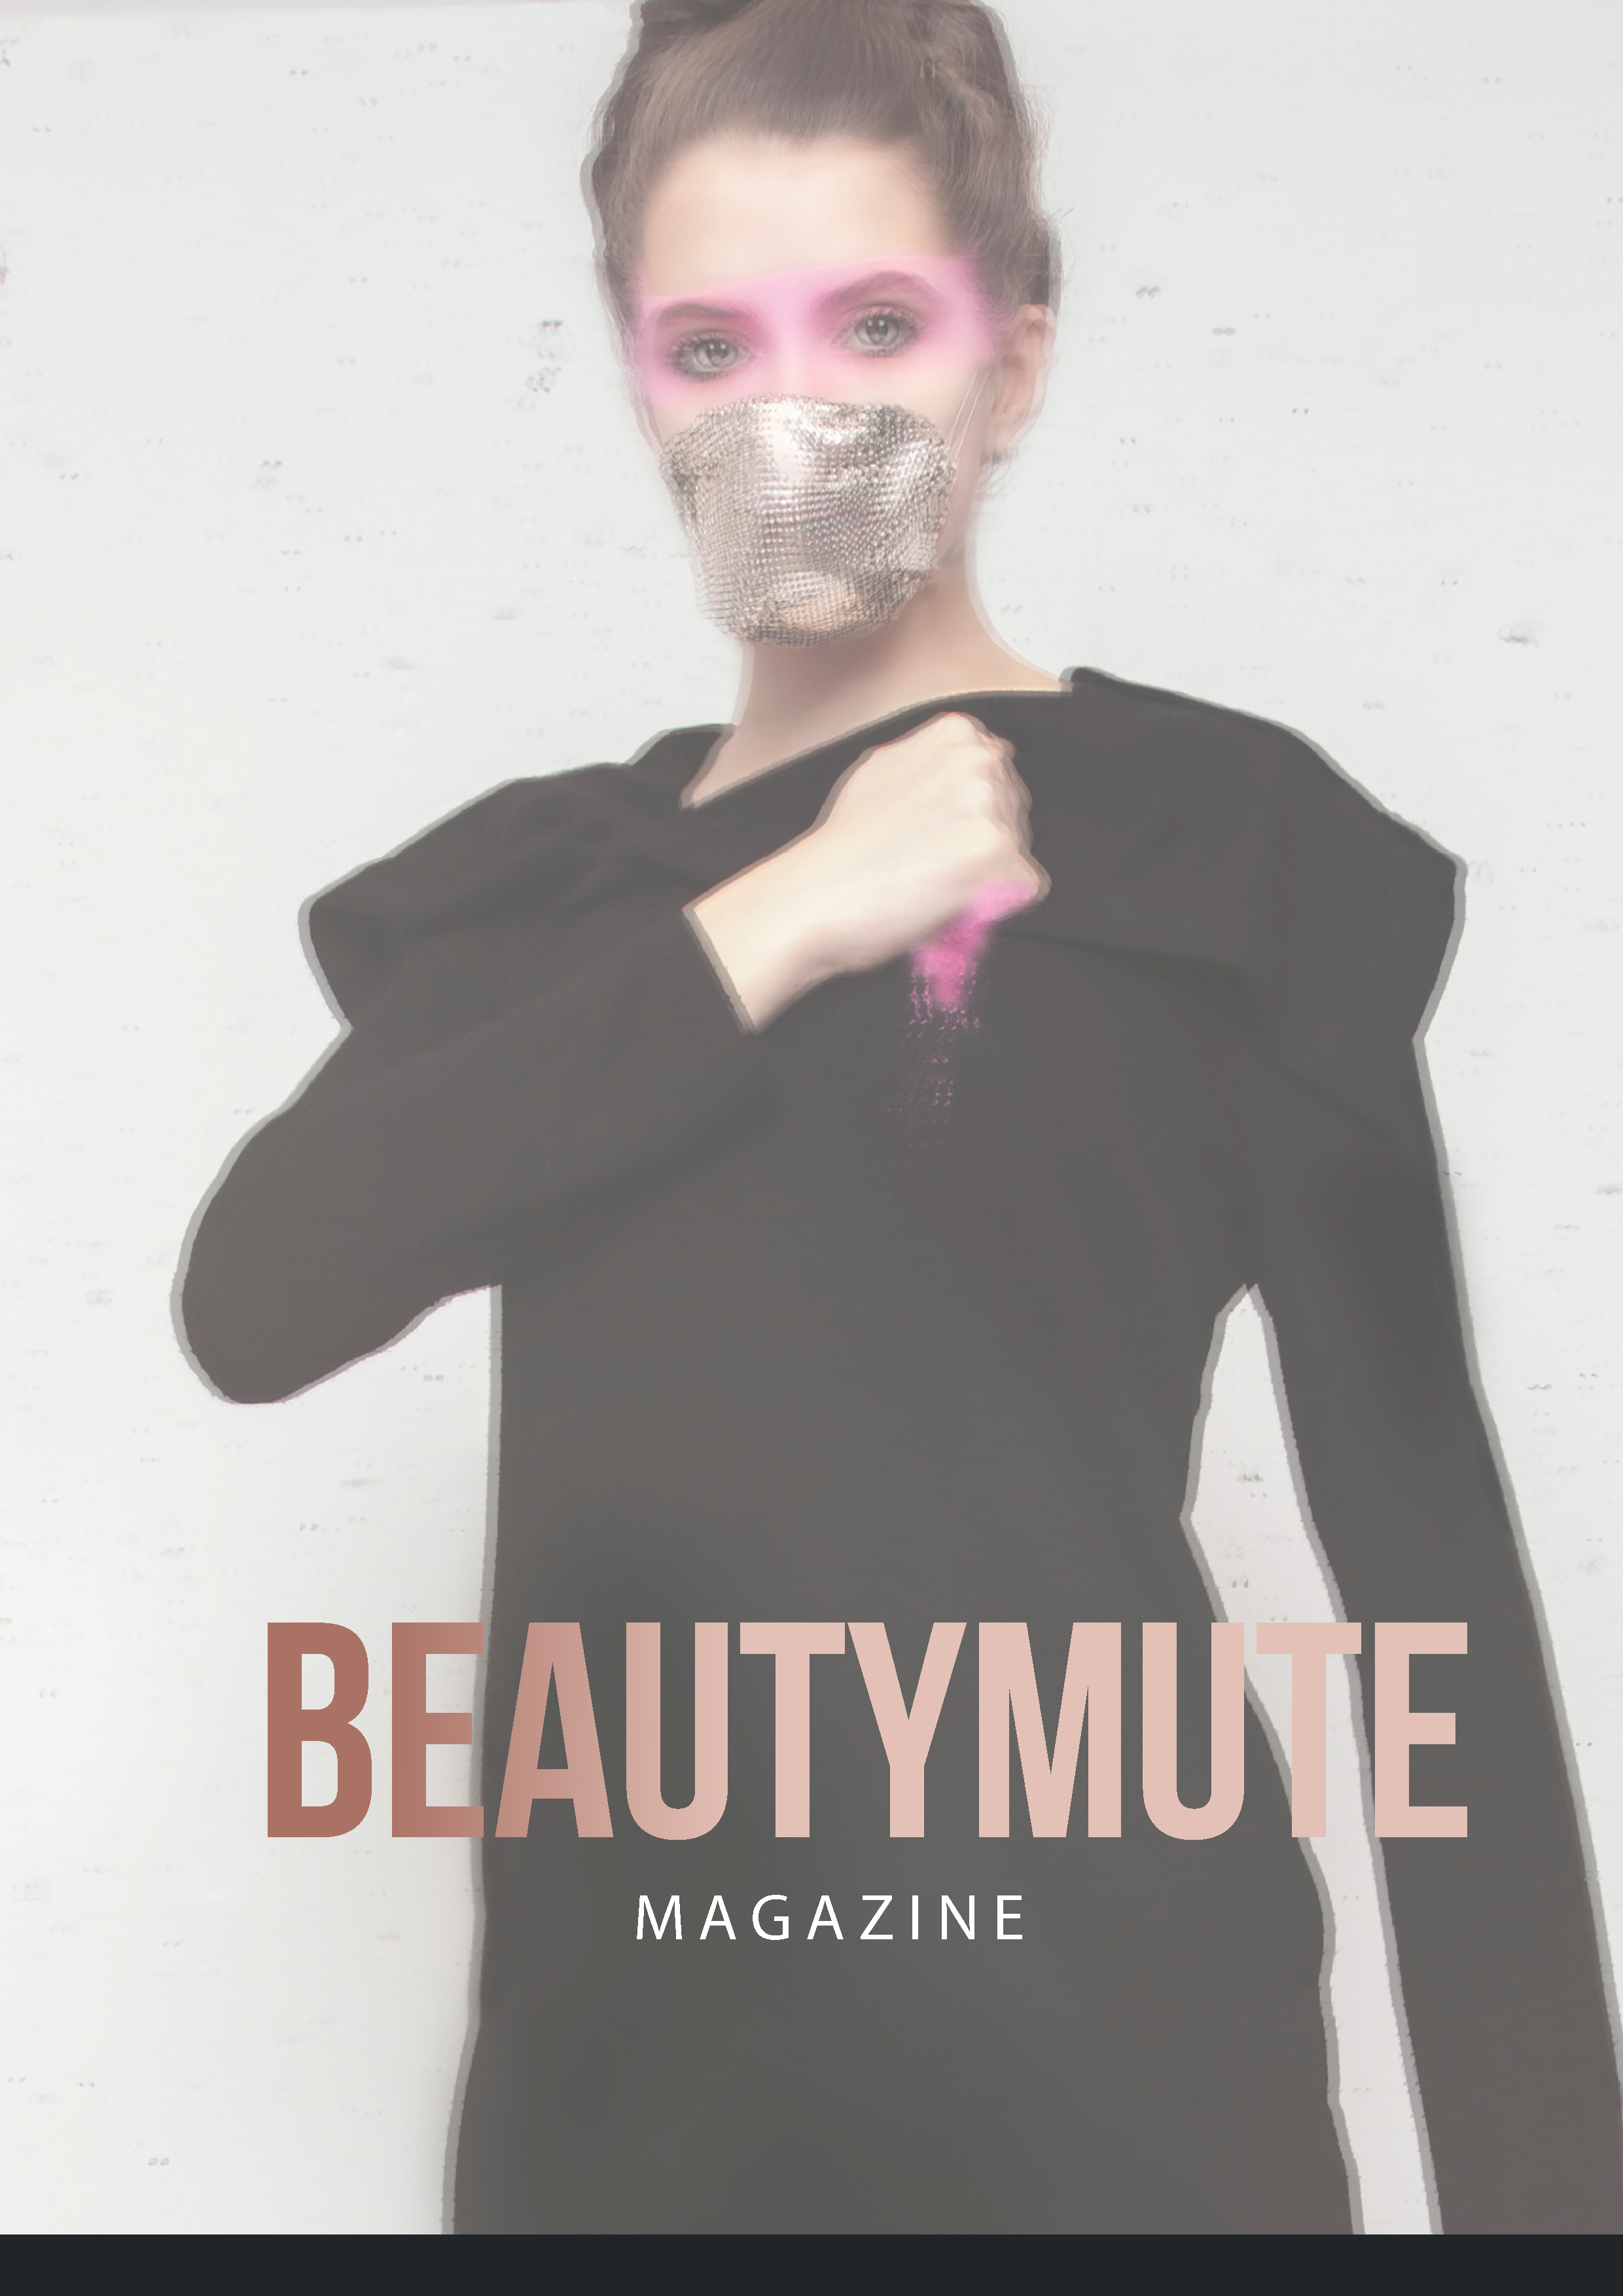 Beauty Mute Magazine Back Cover